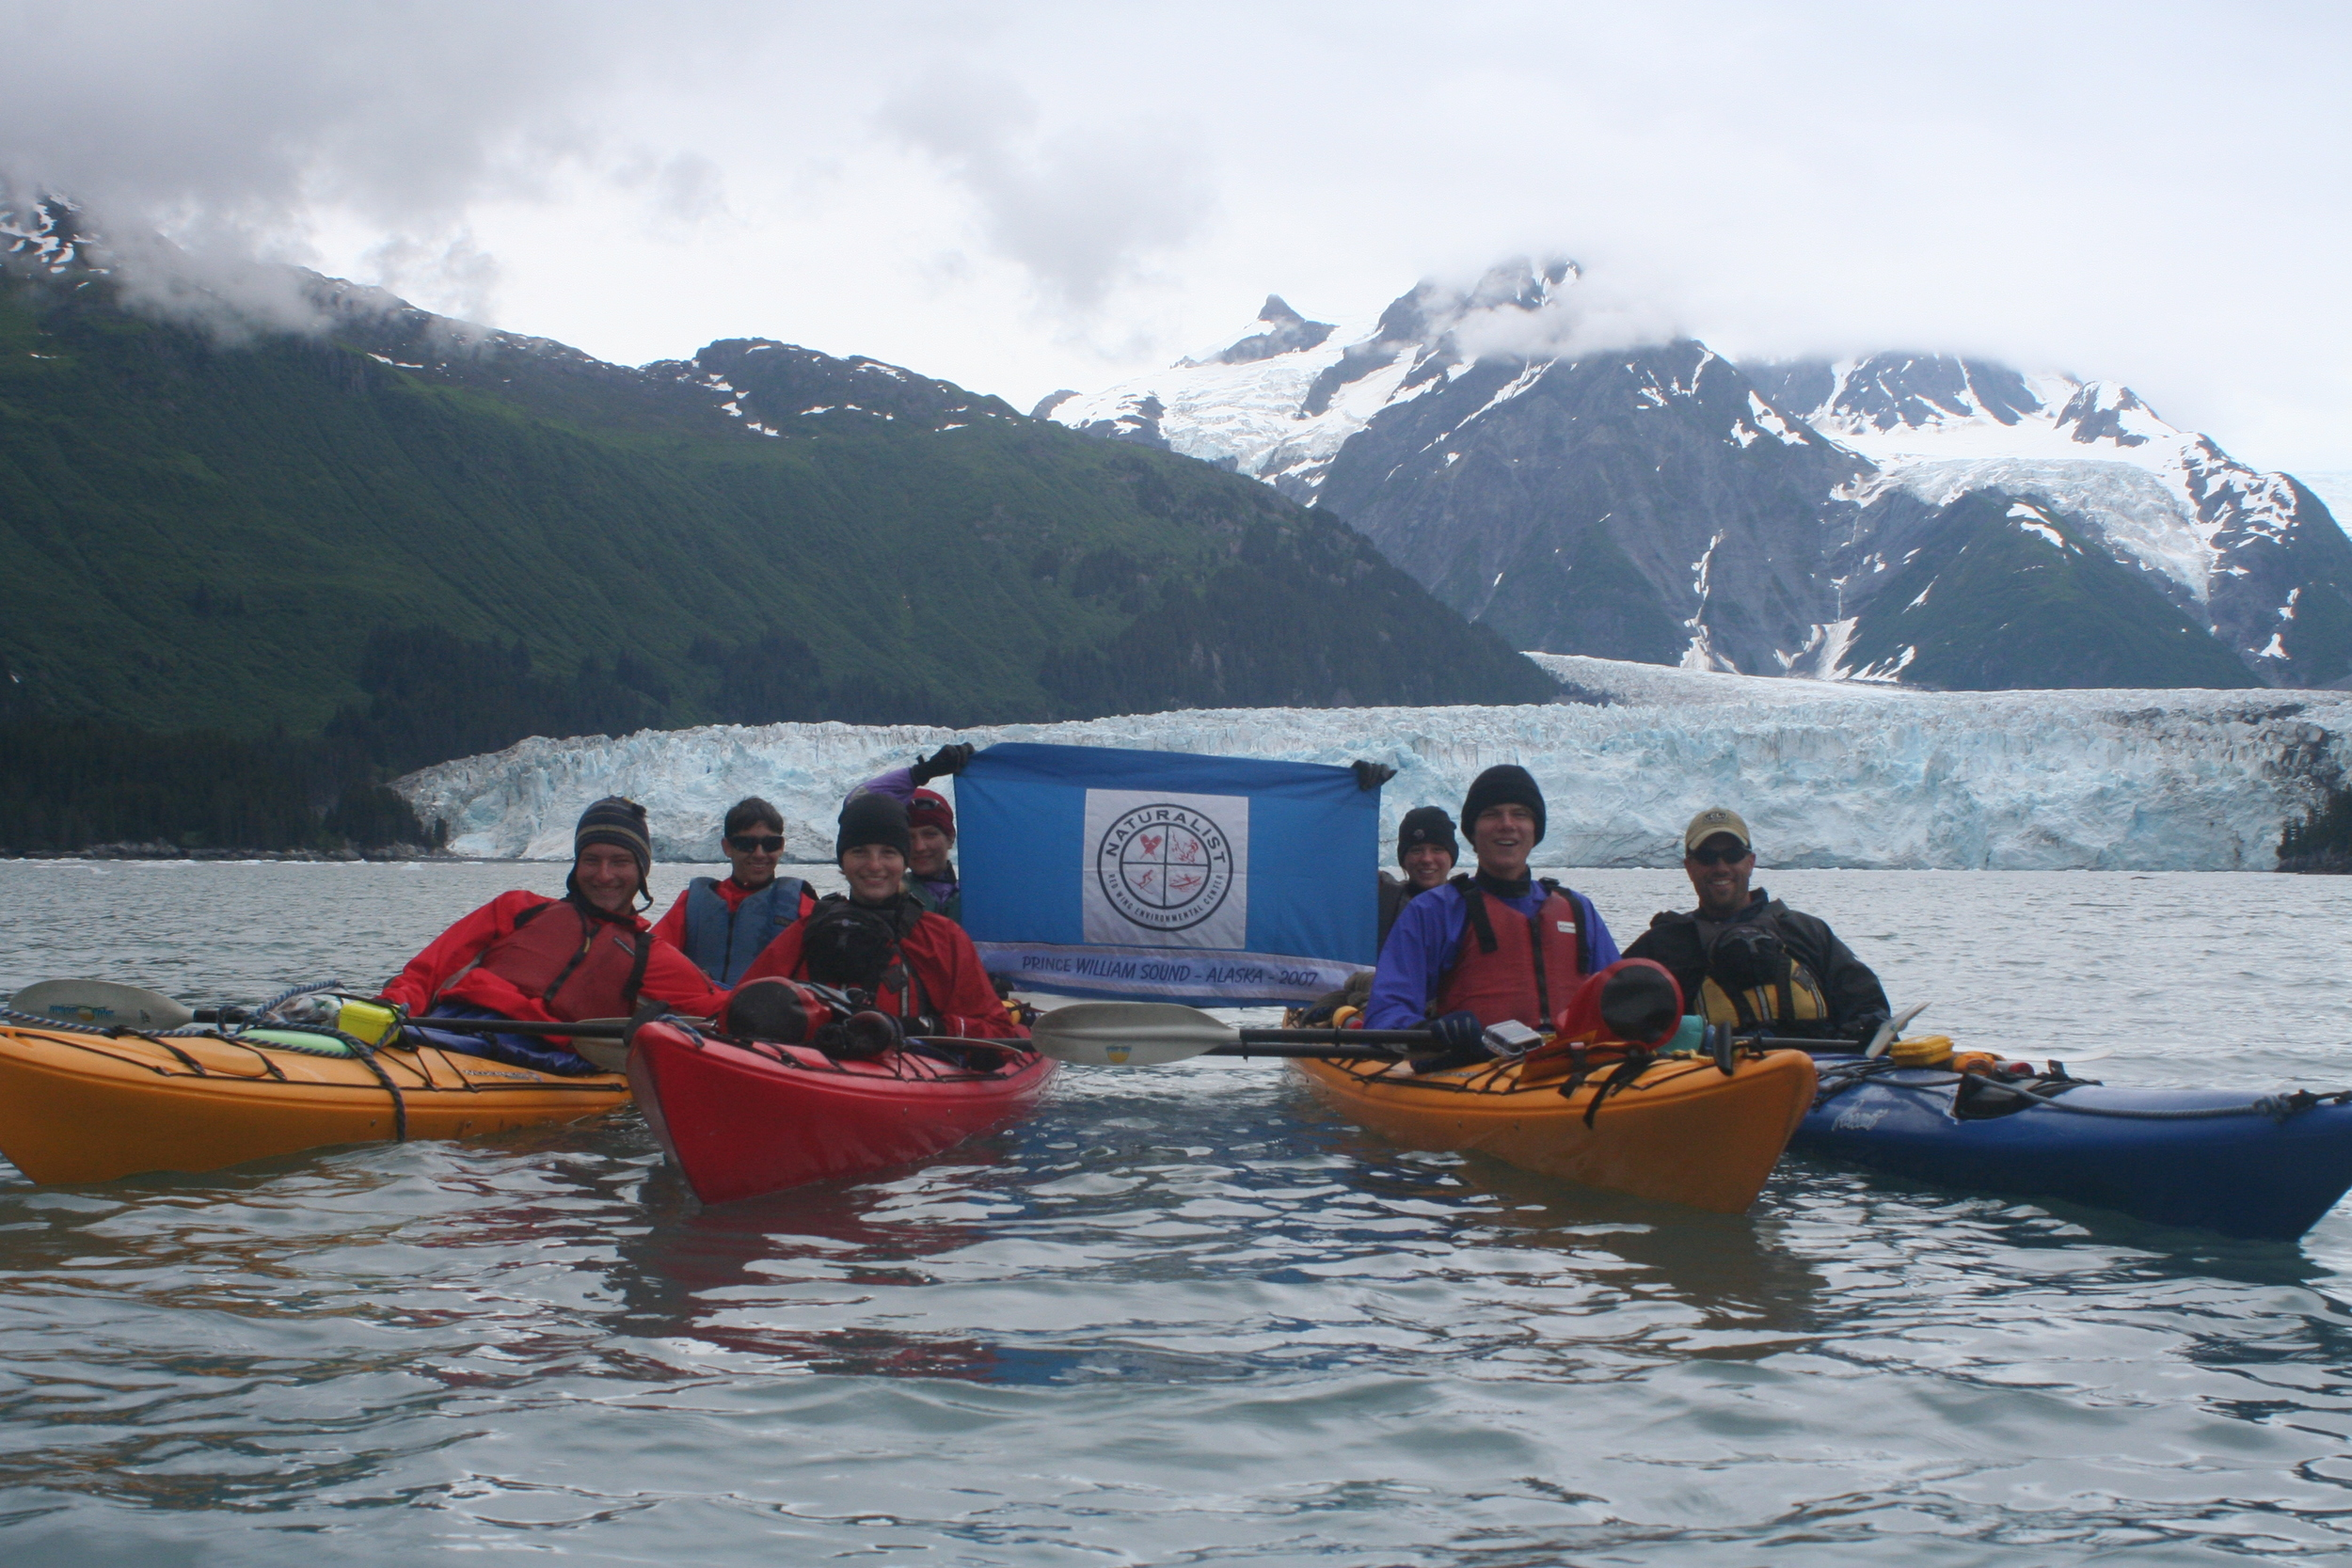 Sea Kayaking in Prince William Sound, Alaska